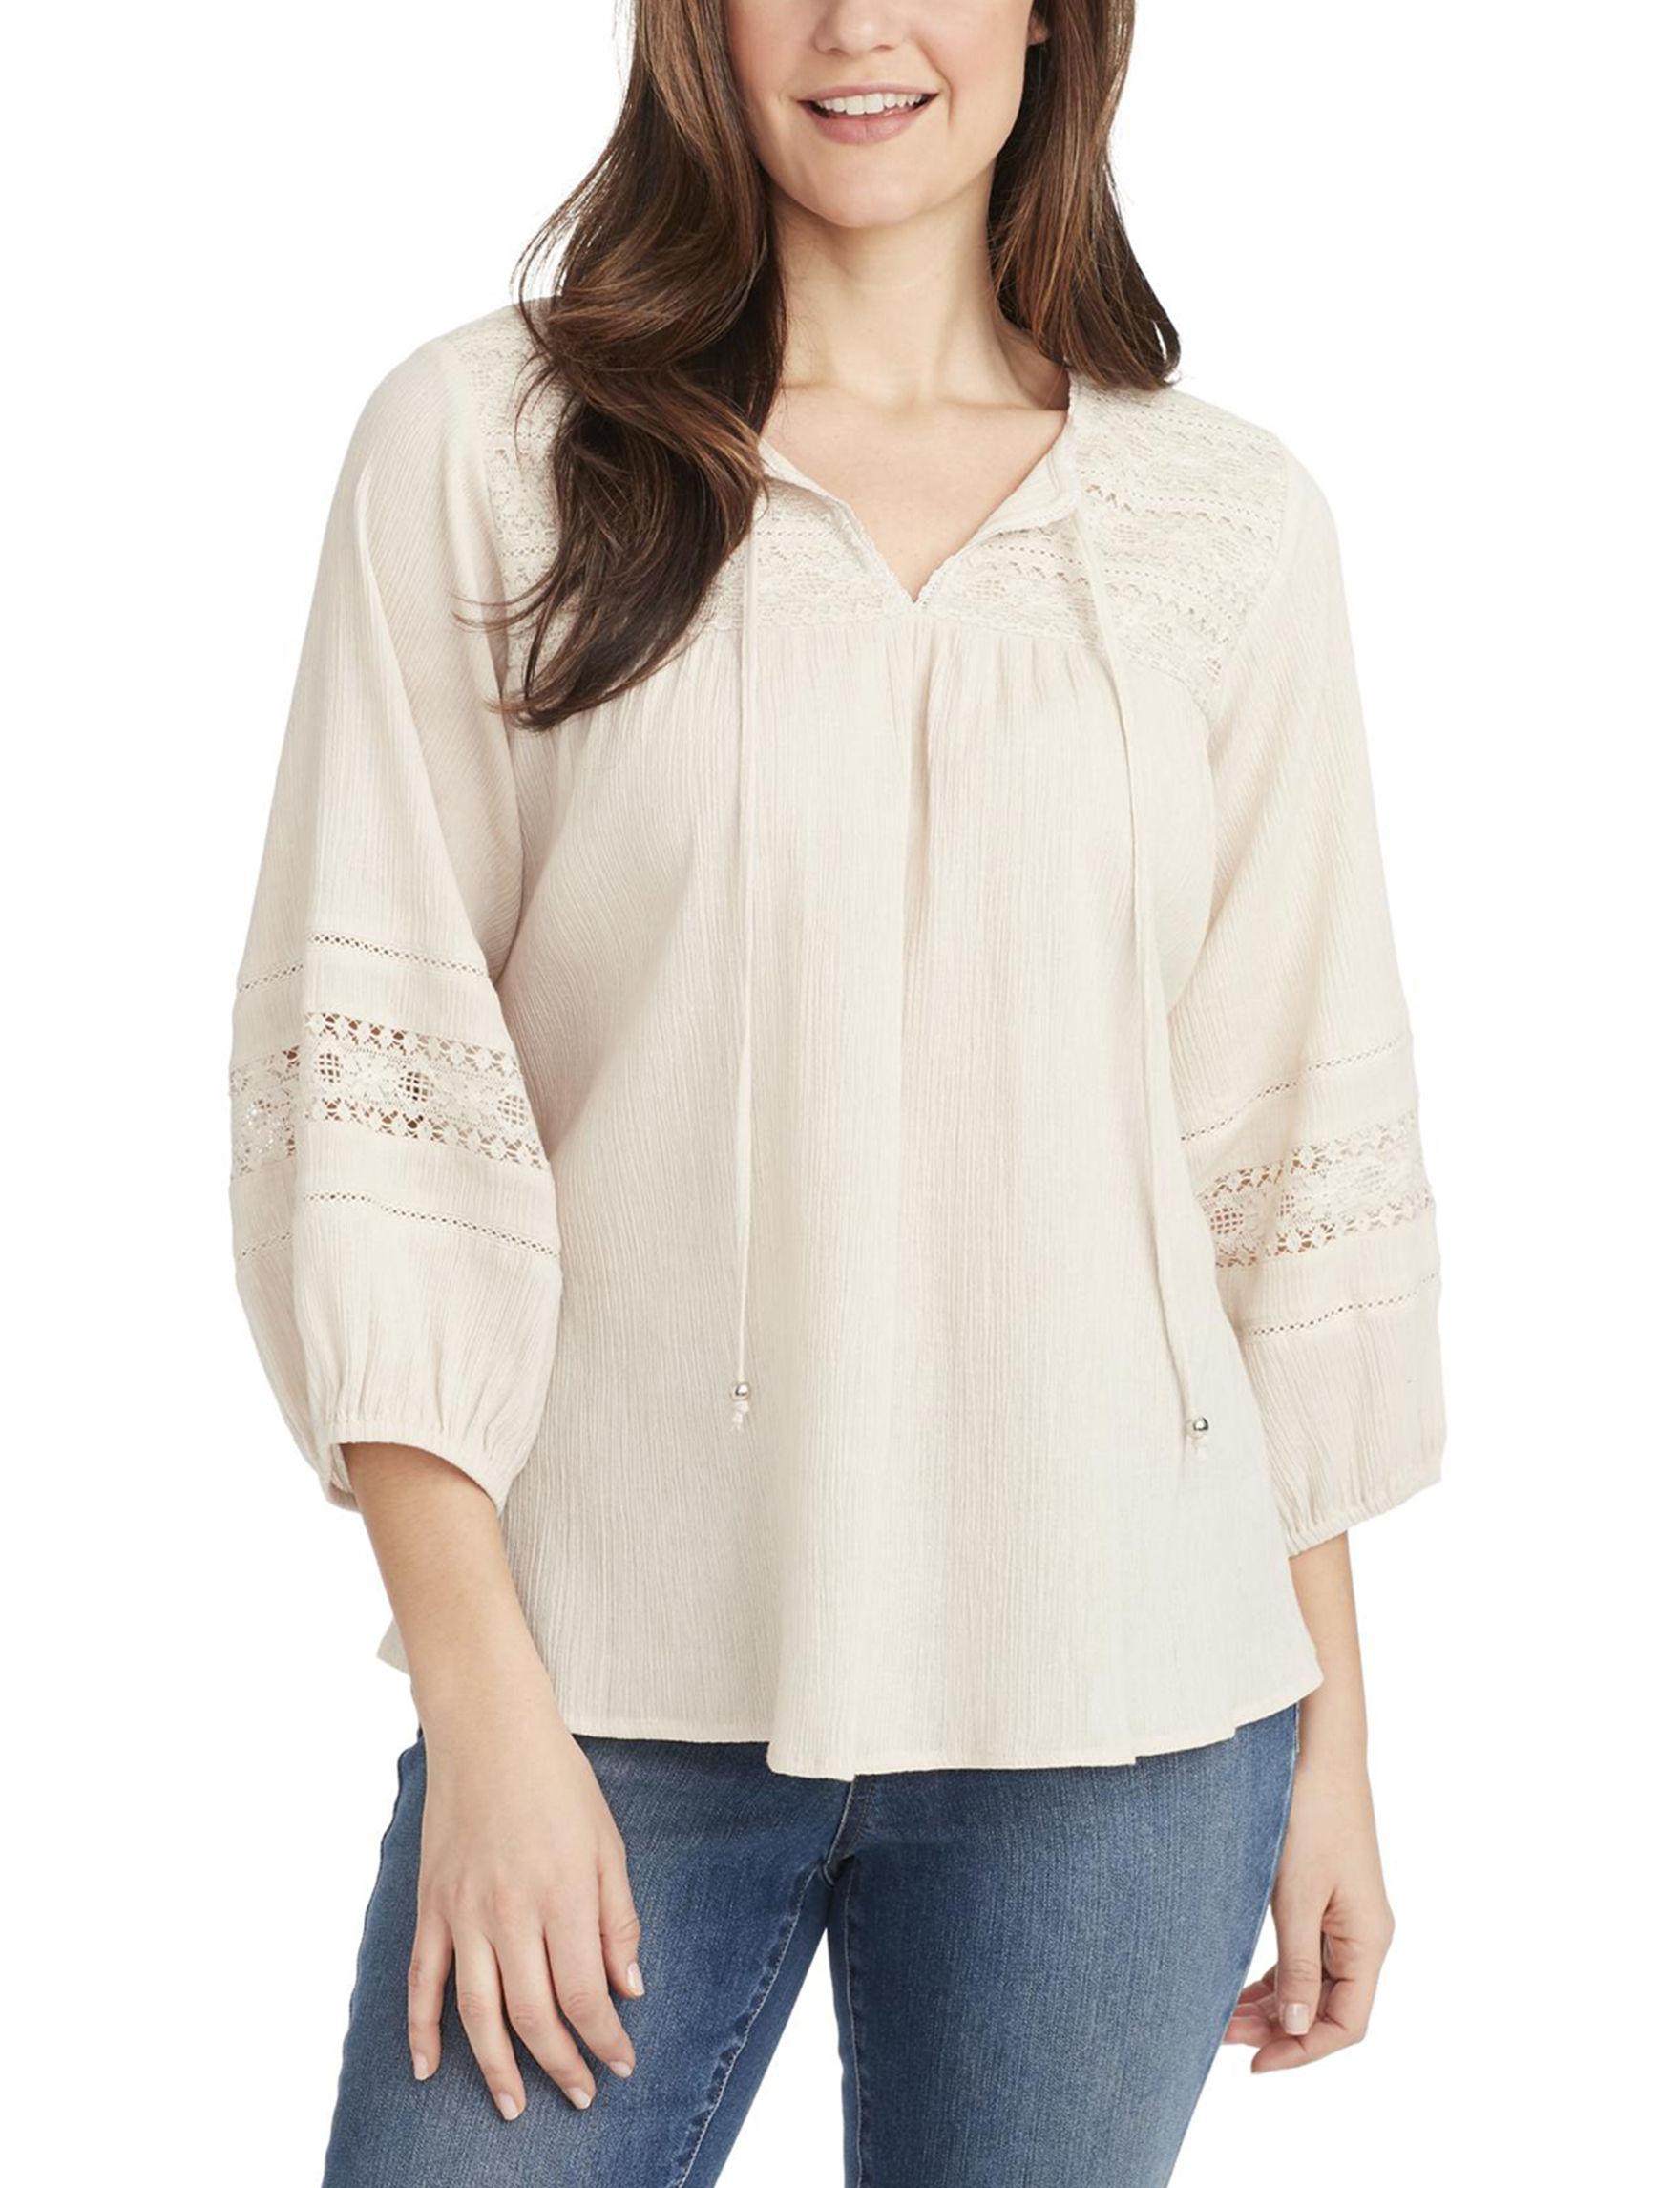 Bandolino Cream Shirts & Blouses